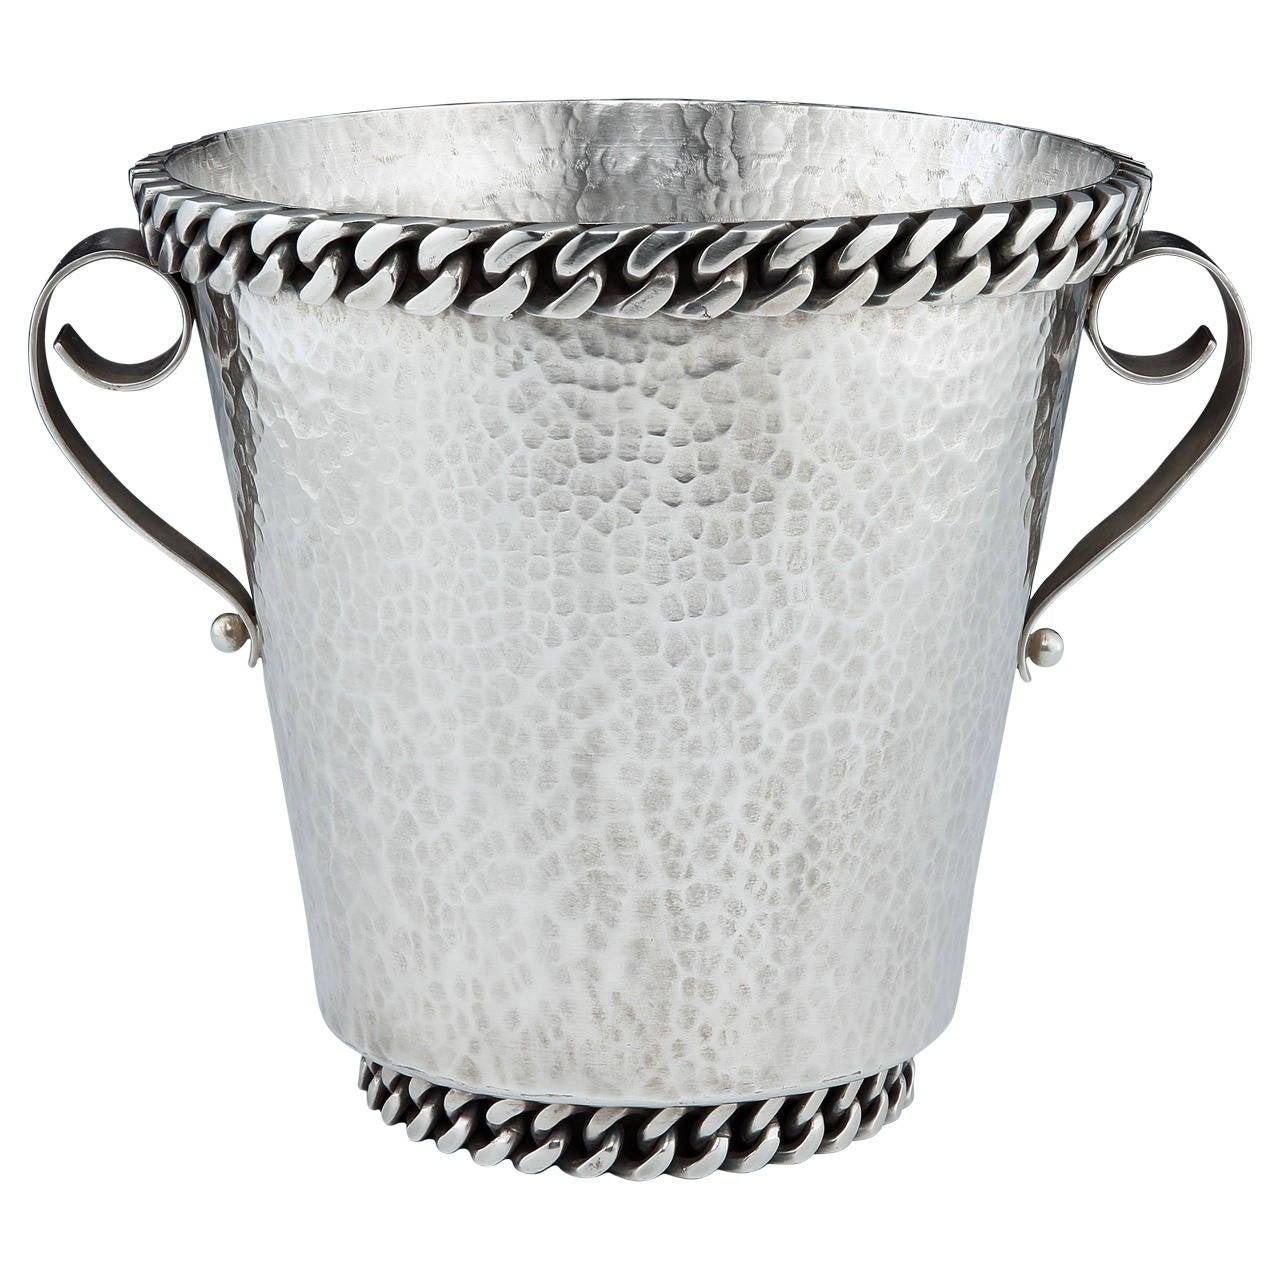 Jean Desprès Champagne Bucket